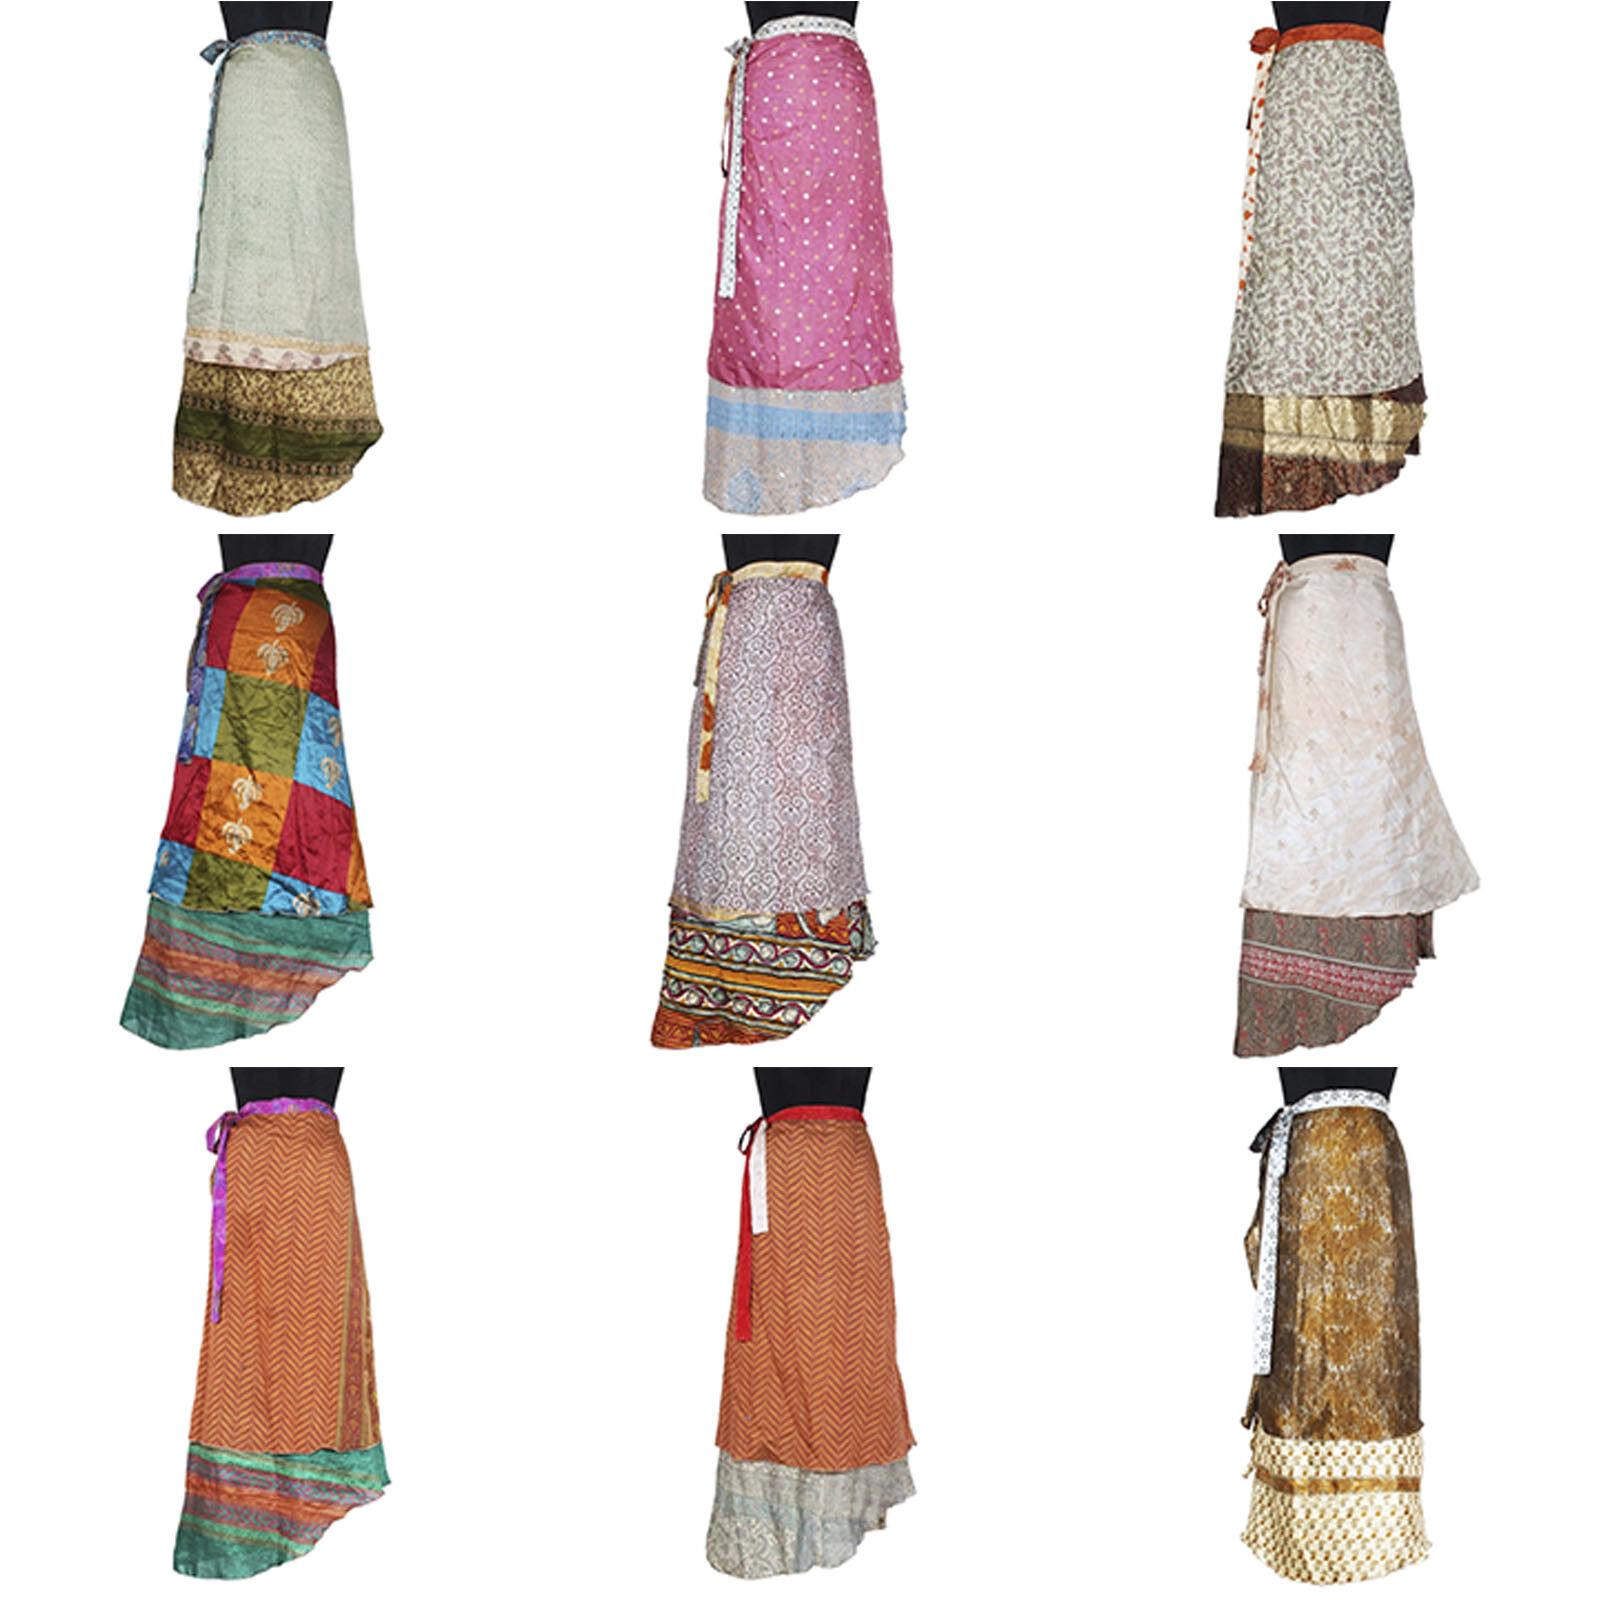 10 Pcs Mix Skirts Indian Bohemian Multi Dress Vintage Silk Sari Skirt Magic